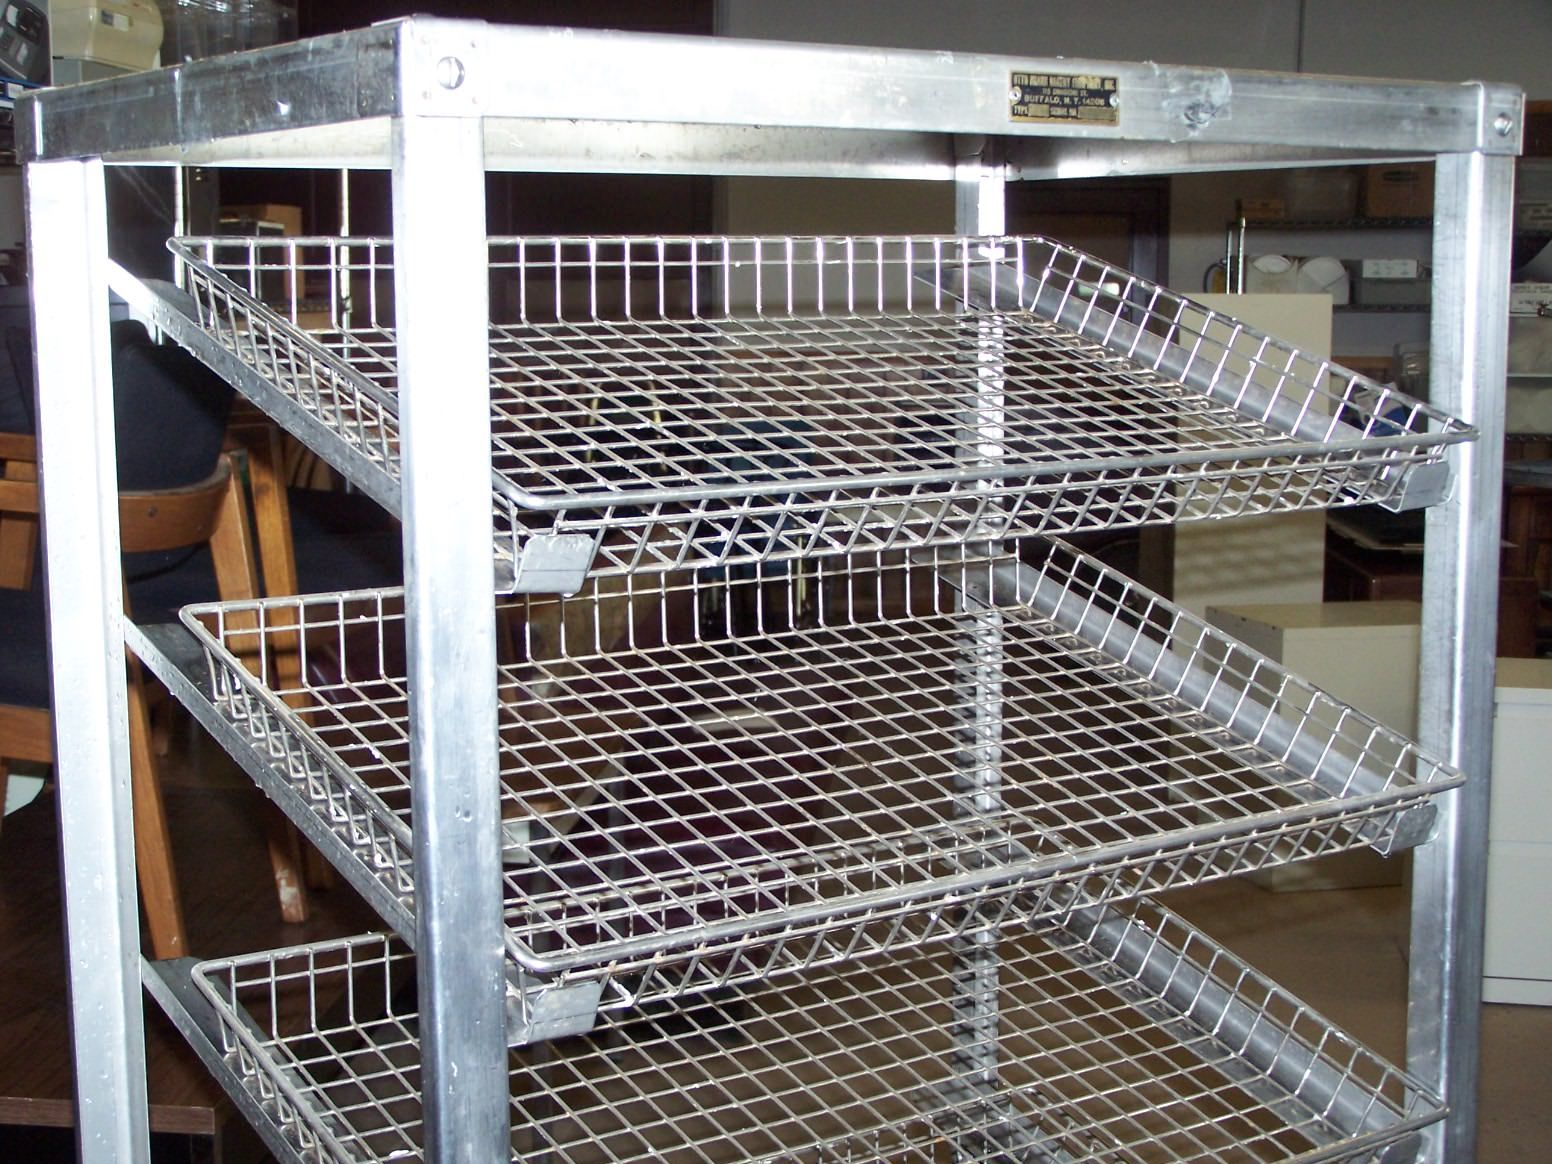 Commercial Bakers Rack Design Styles In 2020 Rack Design Bakers